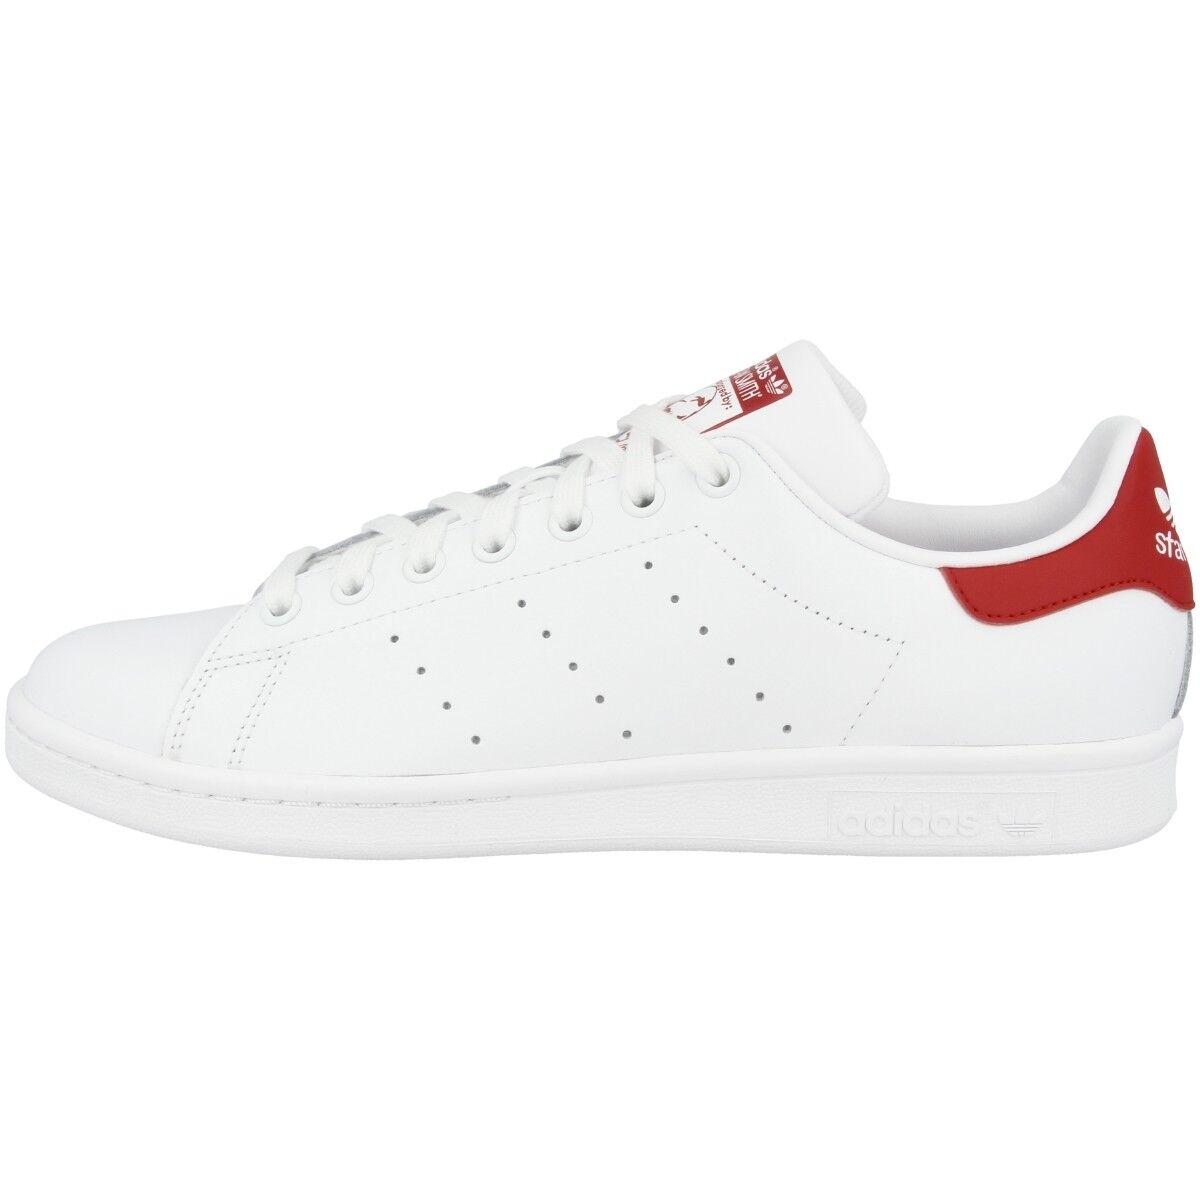 Adidas Stan Smith ROT Schuhe Retro Sneaker WEISS ROT Smith M20326 Tennis Court Samba 46c7f4